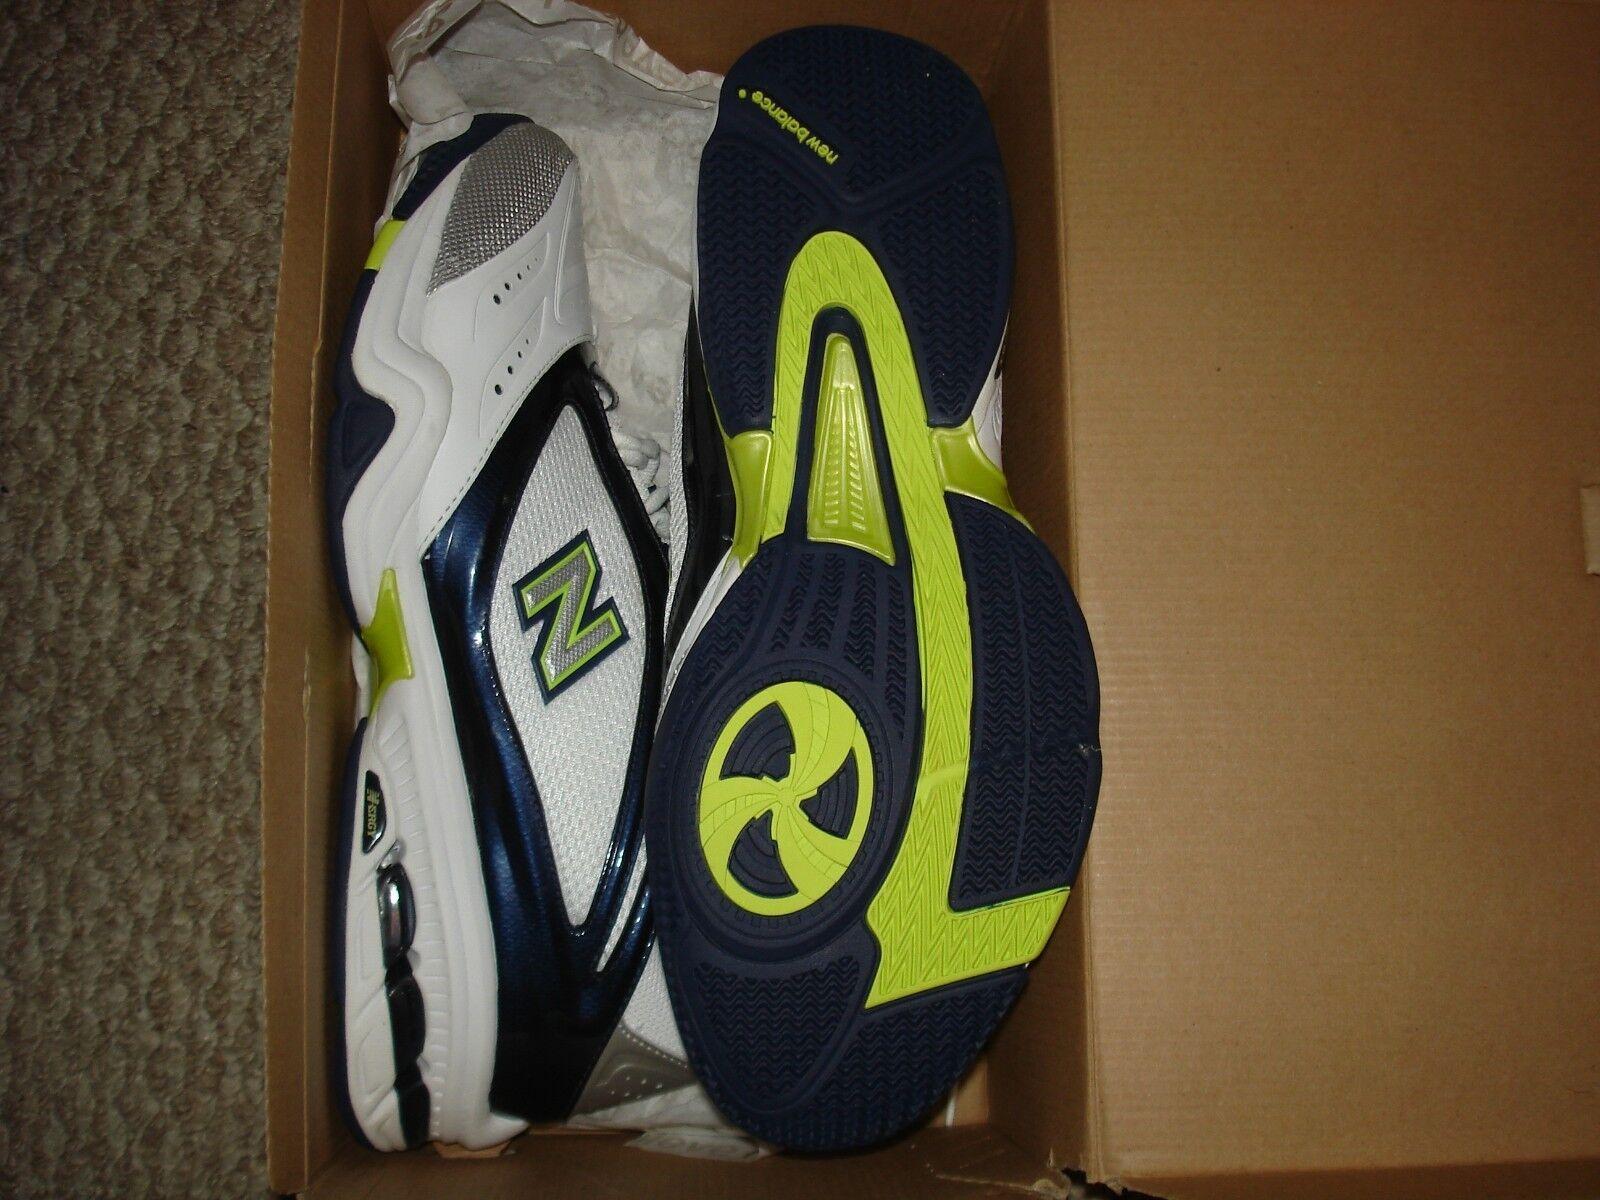 NIB New Balance MC900 MC900WT Tennis shoes Size 12.0 BRAND NEW